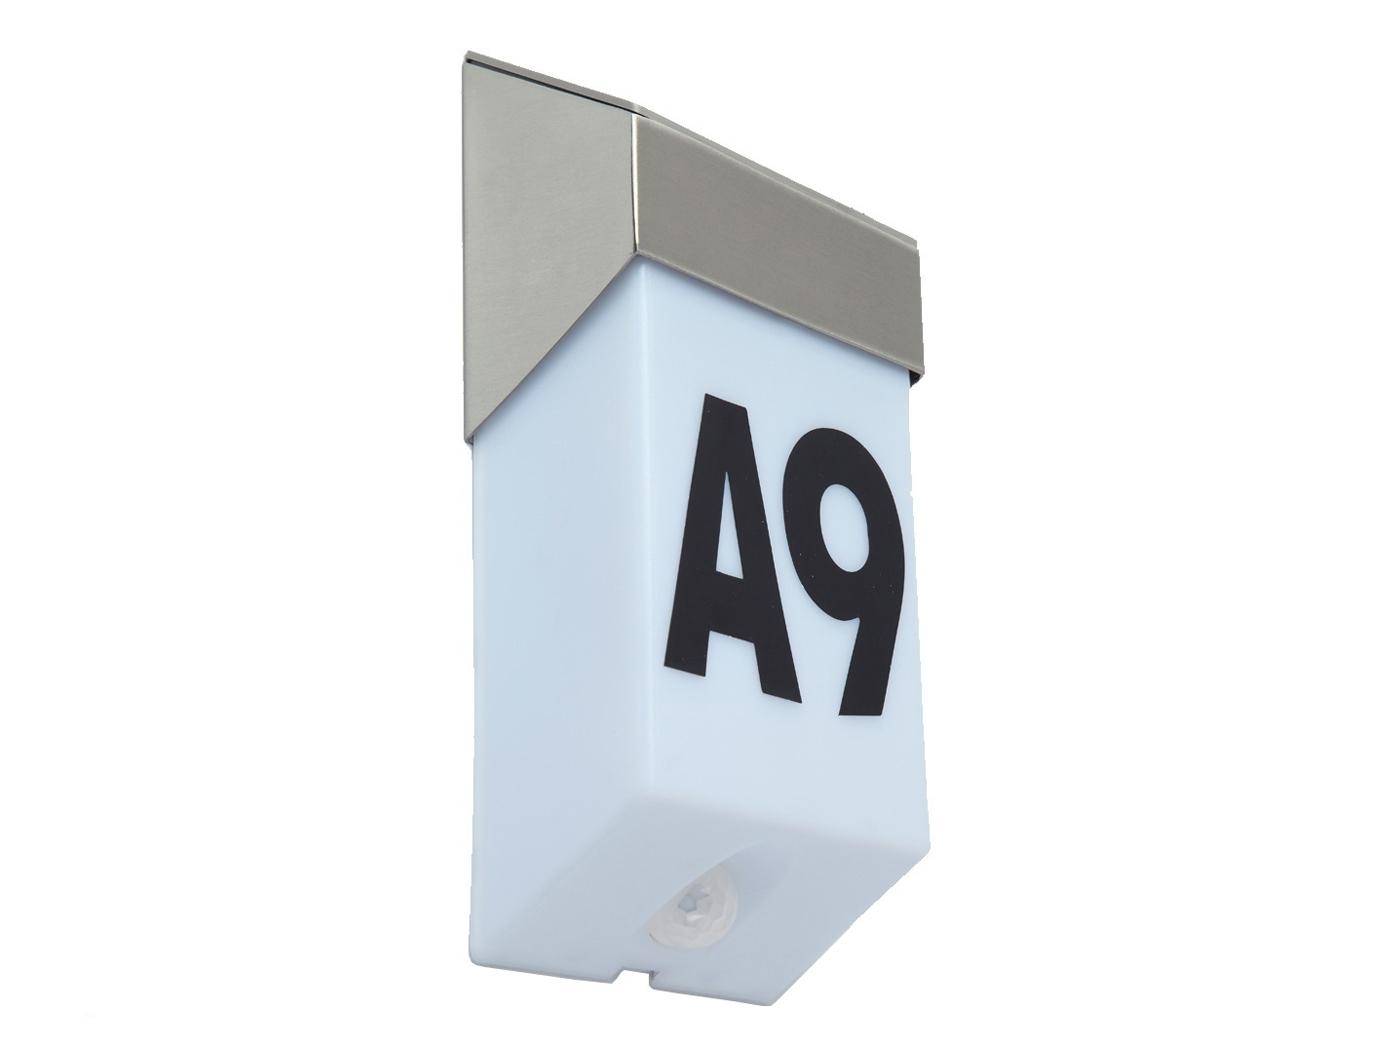 LED-Ausenwandleuchte-mit-Solar-Bewegungsmelder-Hausnummern-IP44-Wandleuchten miniatura 3